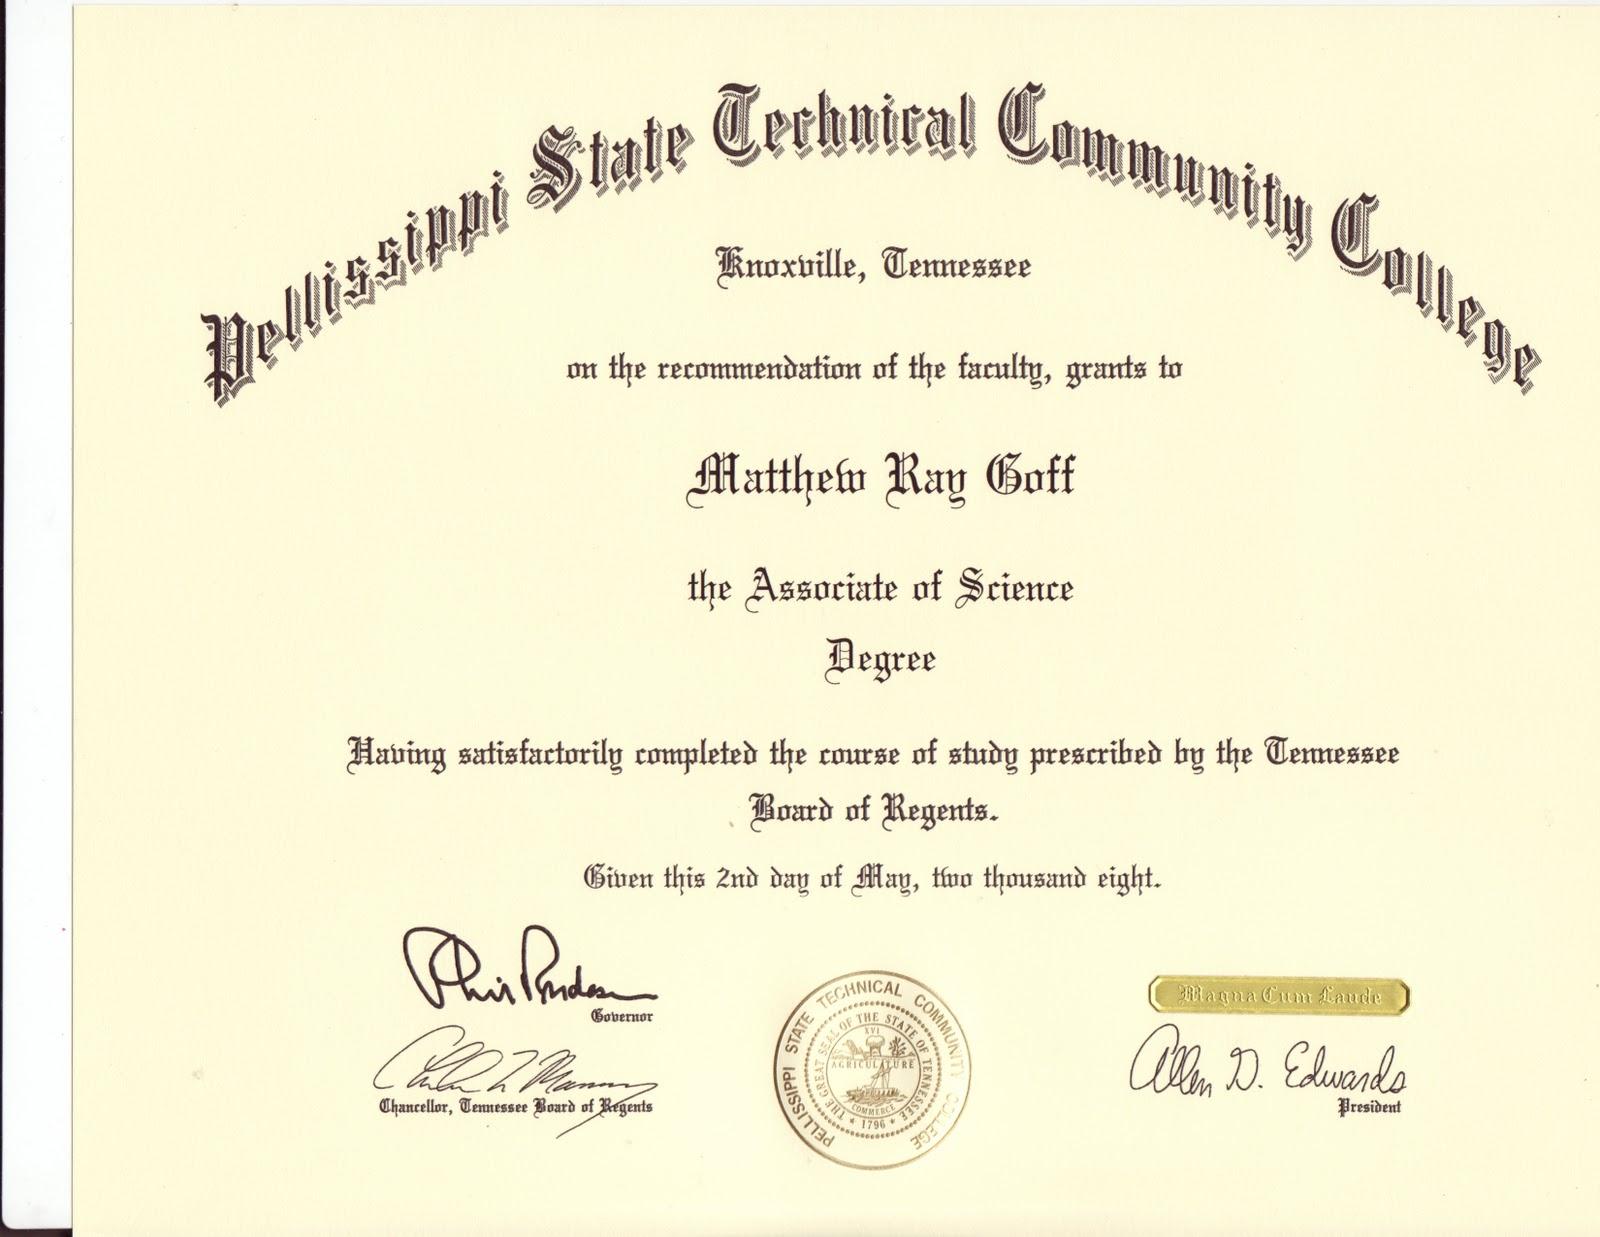 matthew goff u0026 39 s portfolio  certifications and scholarships